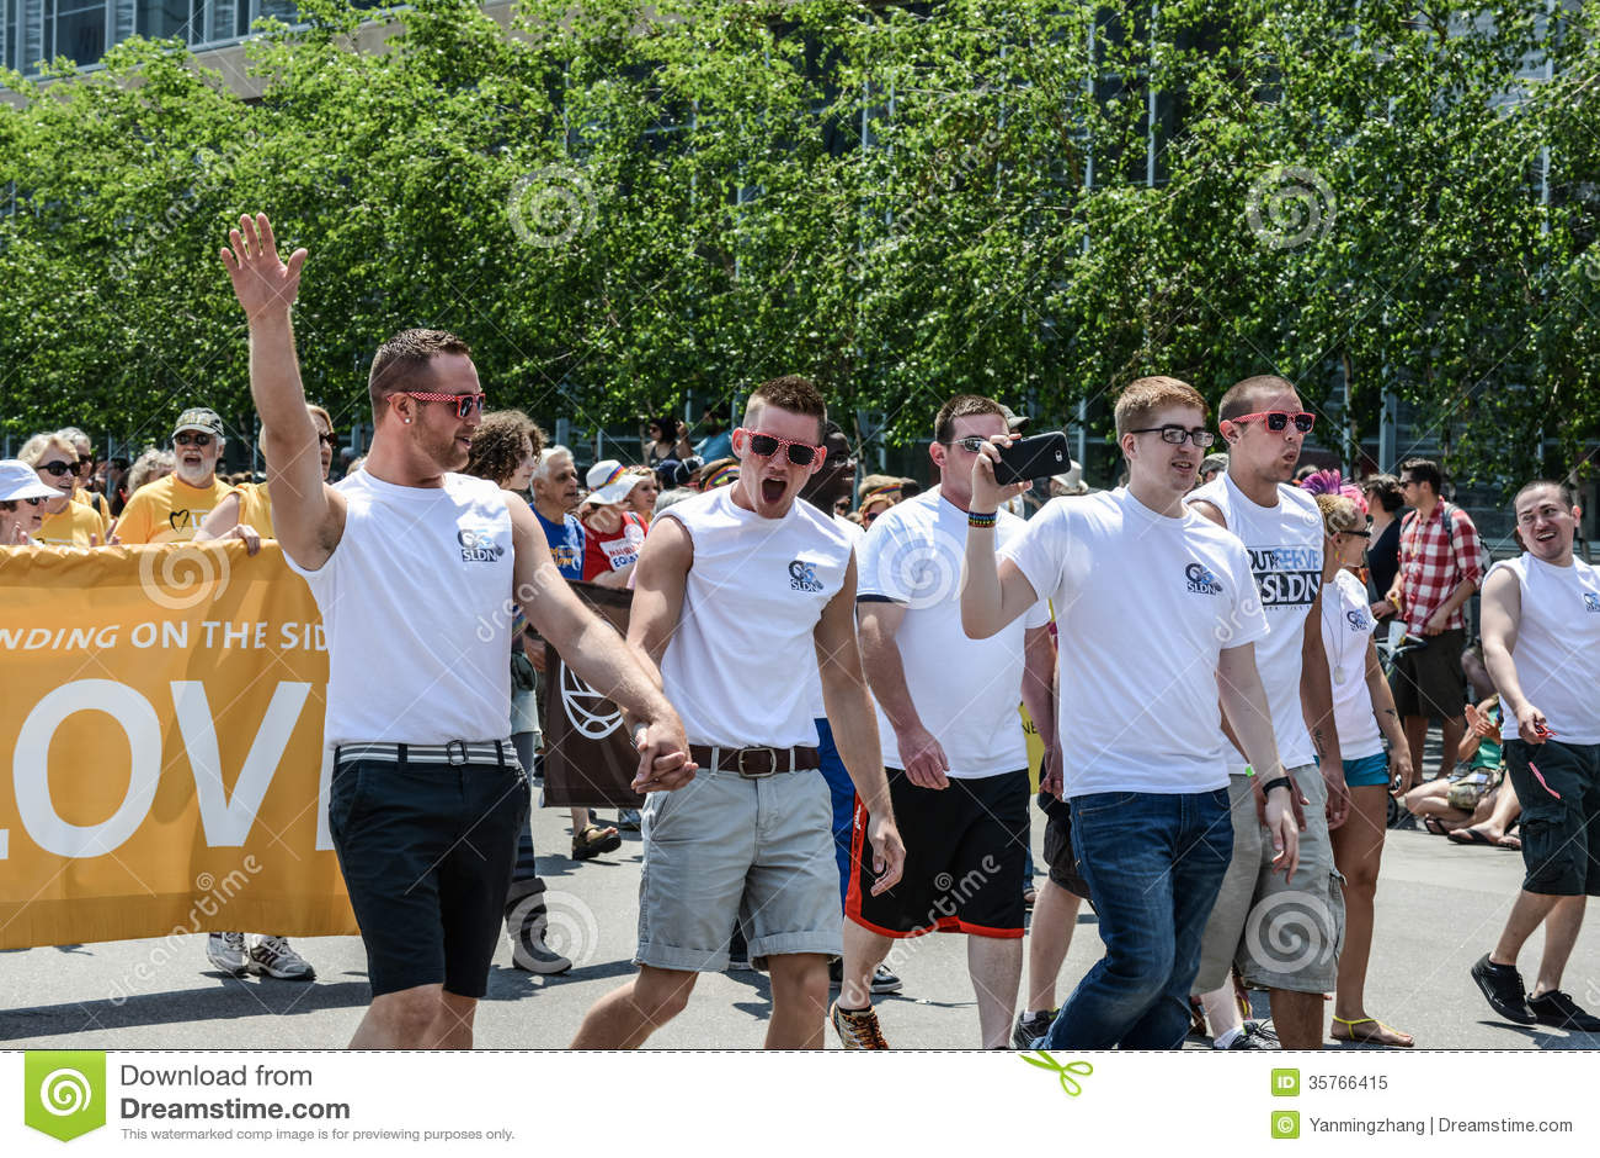 silicon valley gay clubs